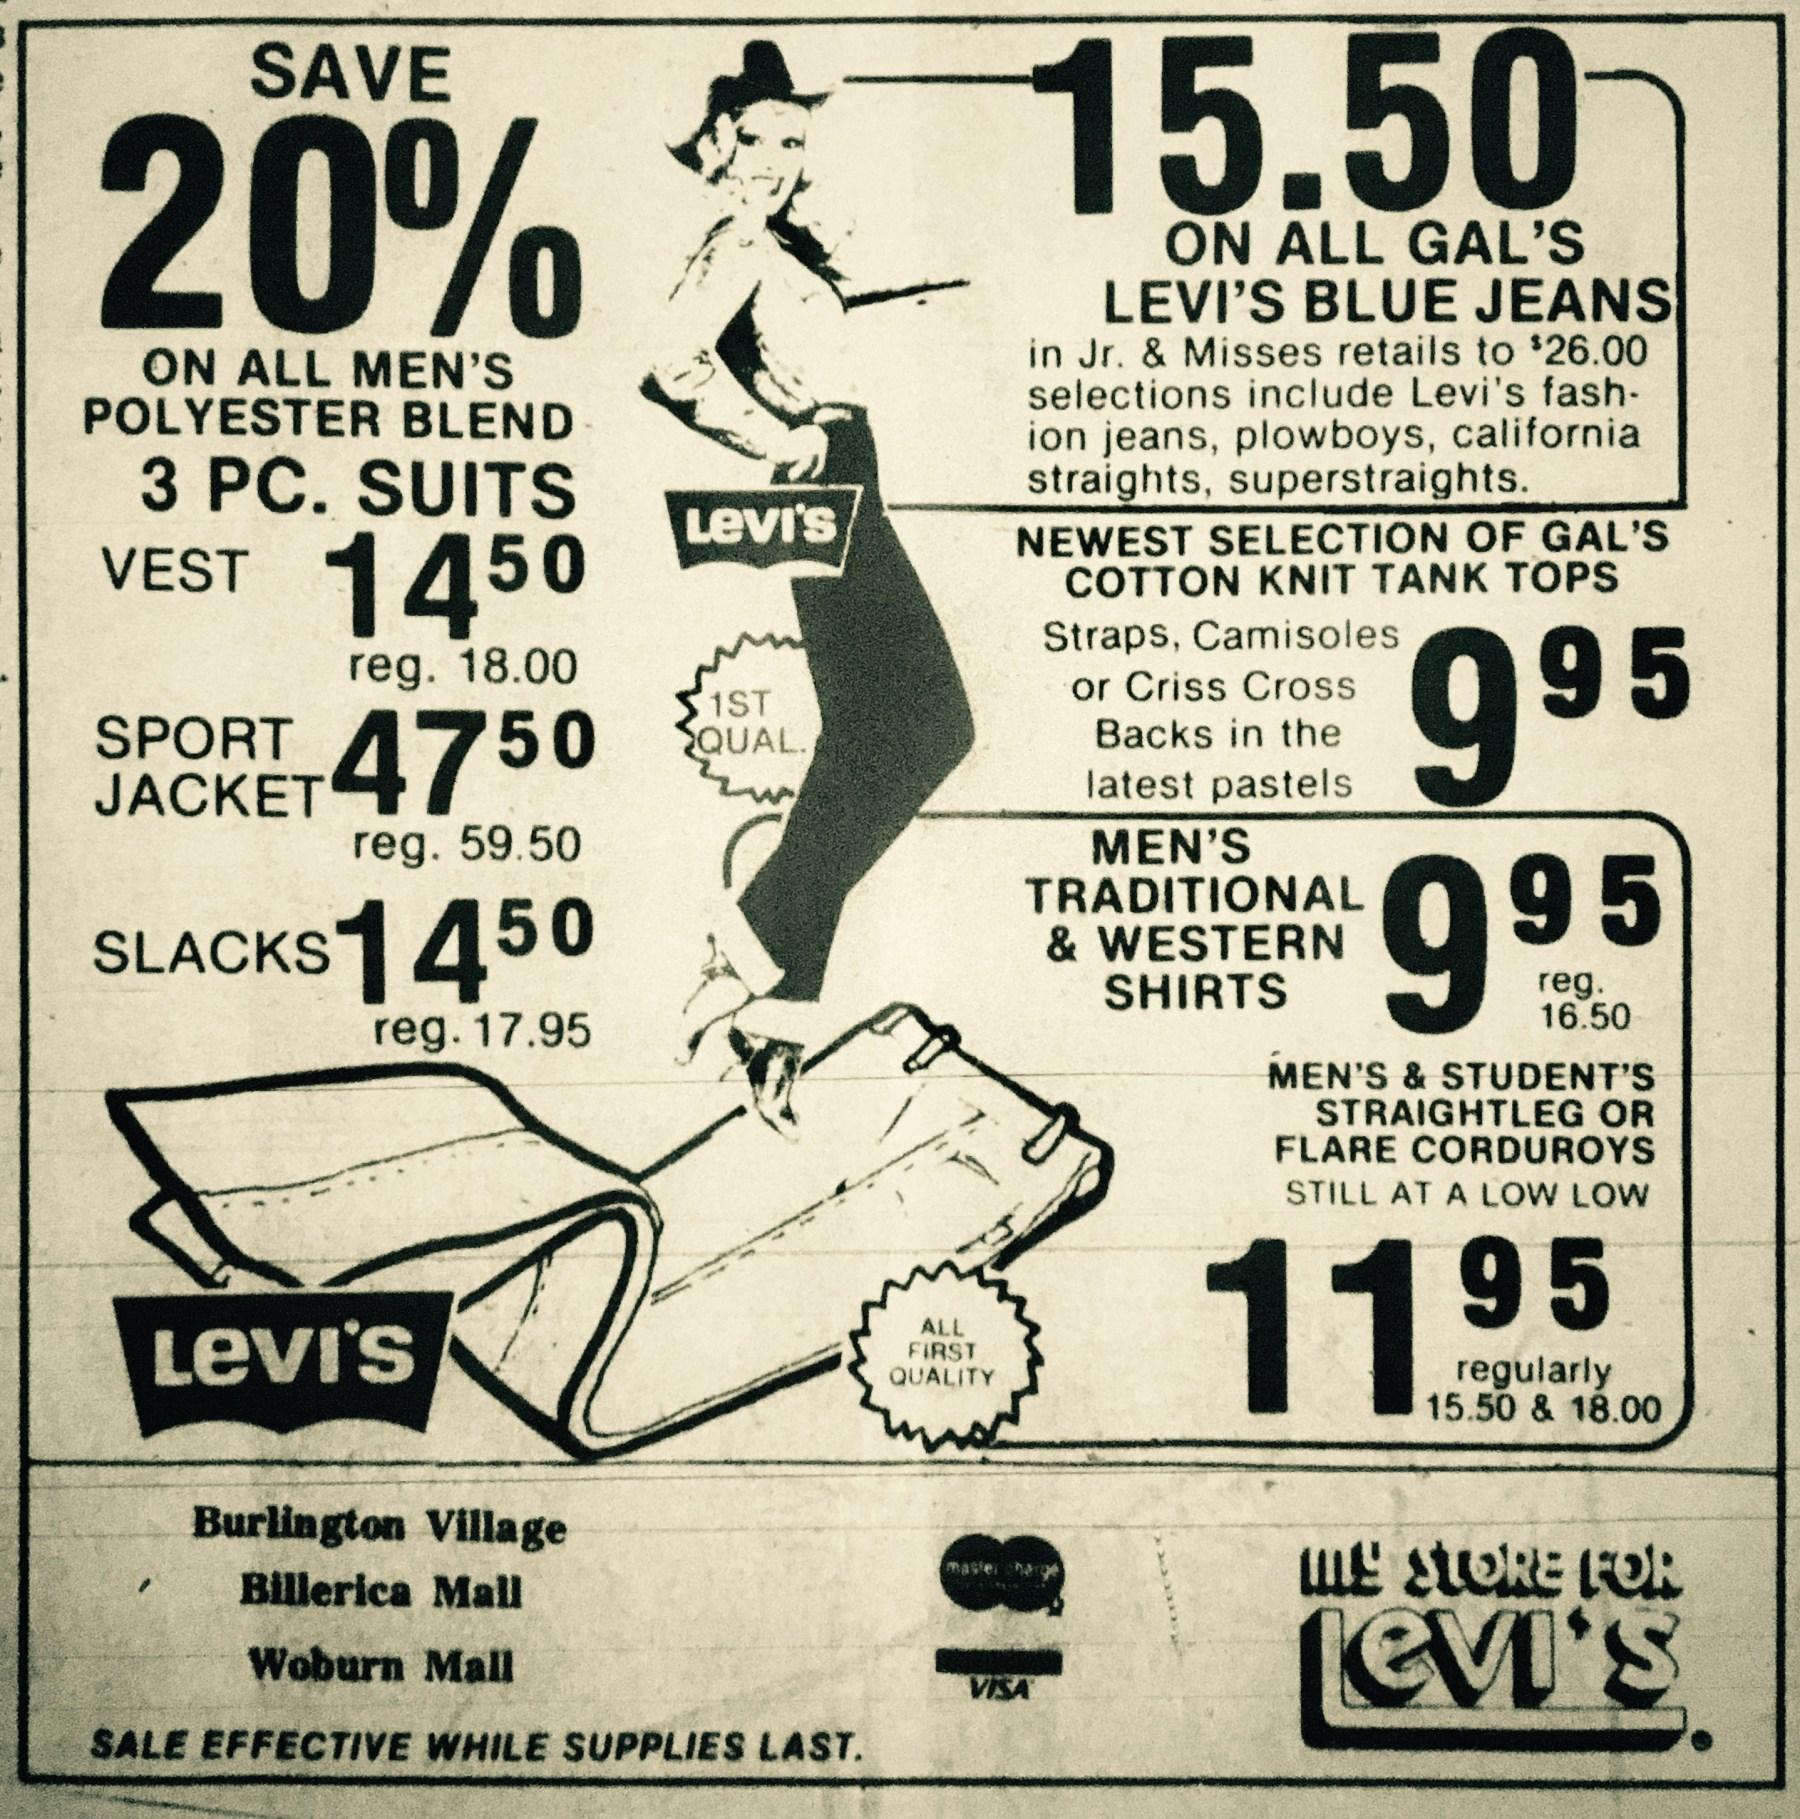 My Store for Levi's, Burlington, MA